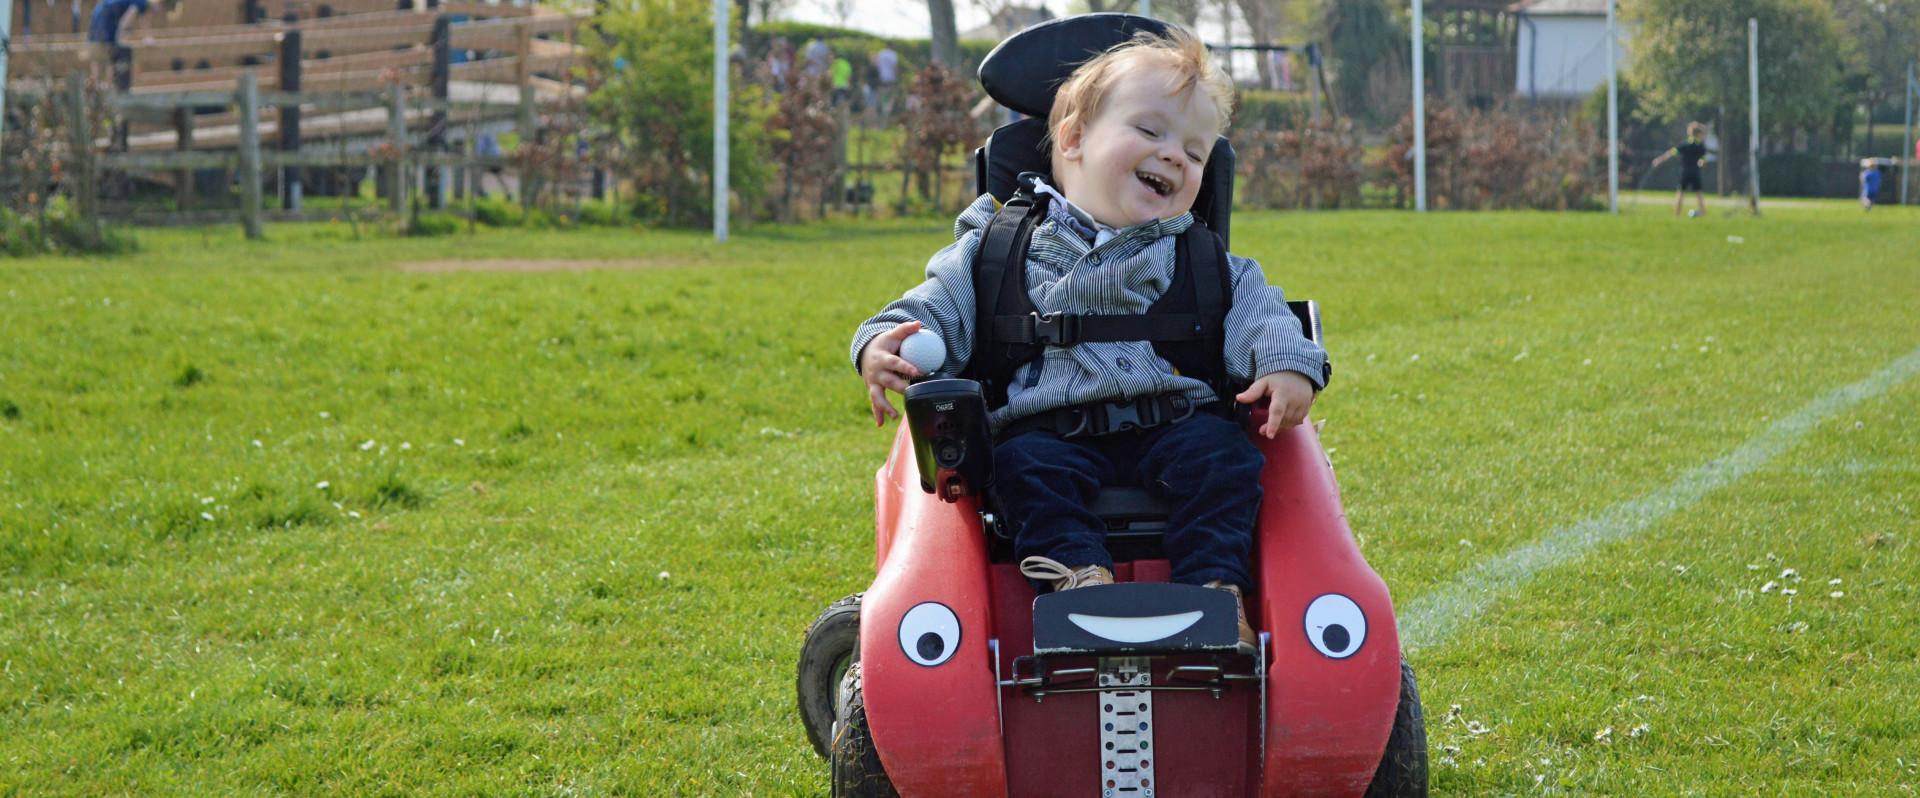 Happy boy in Wizzybug in a park